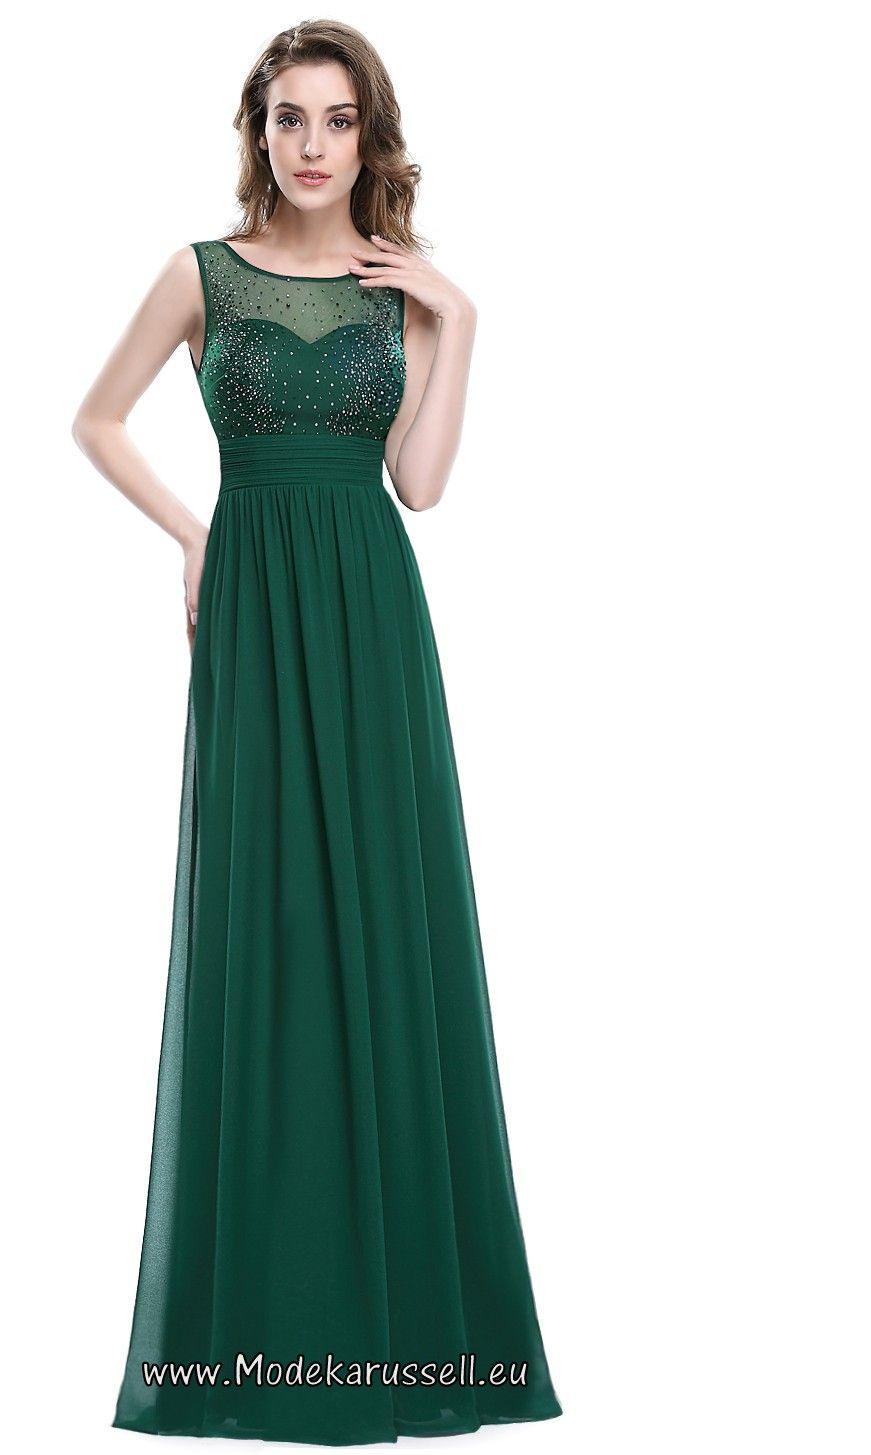 13 Perfekt Grünes Kleid A Linie Spezialgebiet13 Coolste Grünes Kleid A Linie Stylish